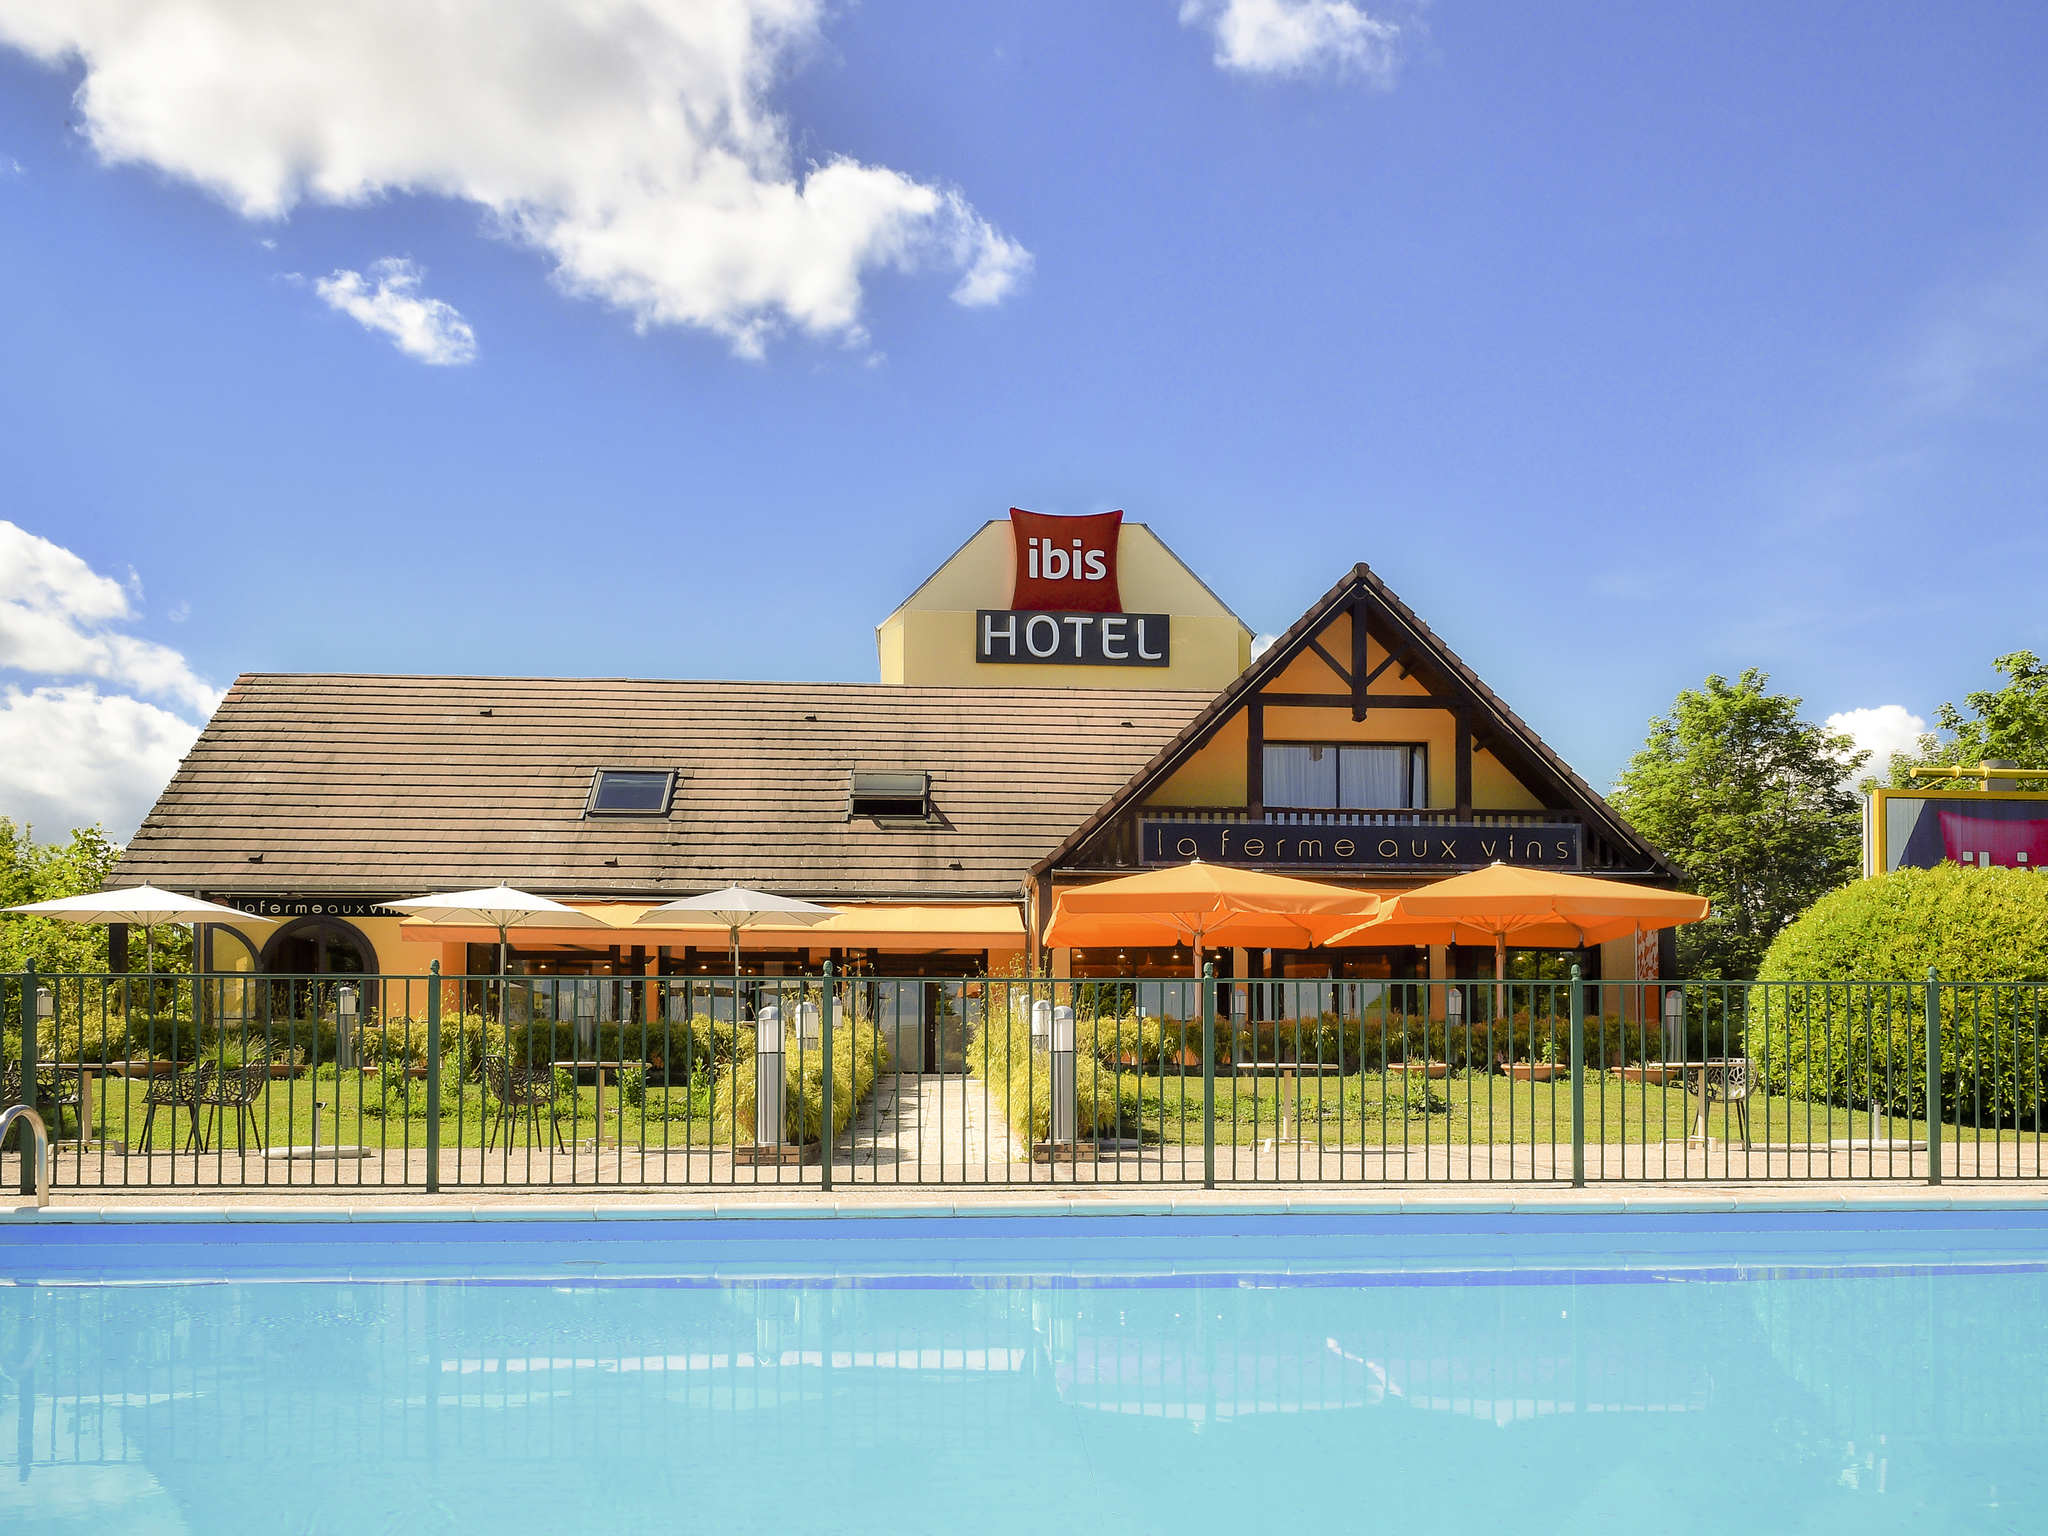 酒店 – 宜必思博纳 La Ferme aux Vins 酒店